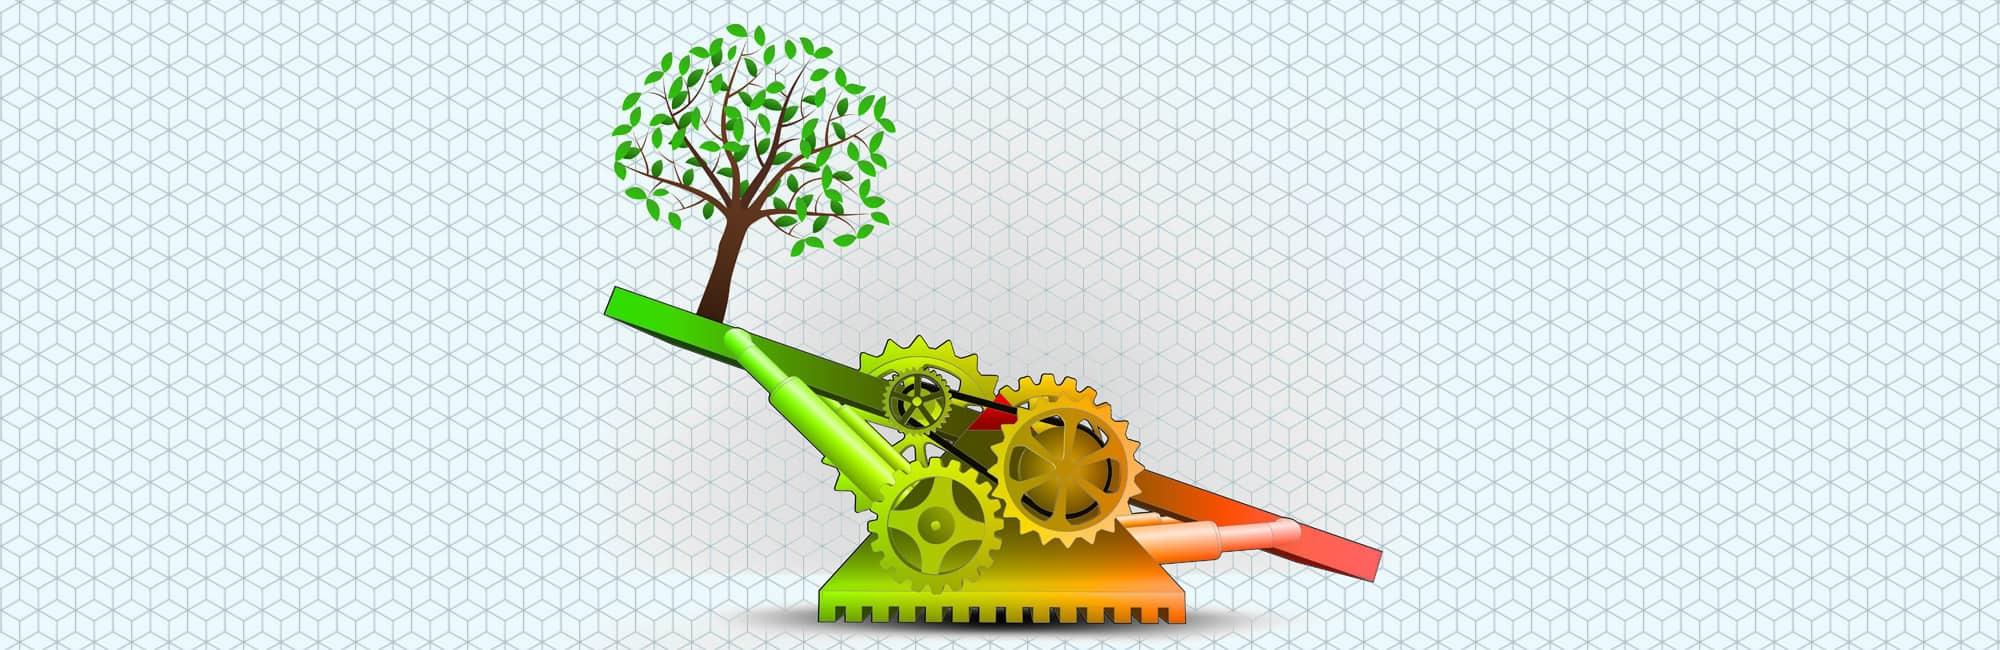 Value Engineering & Value Analysis